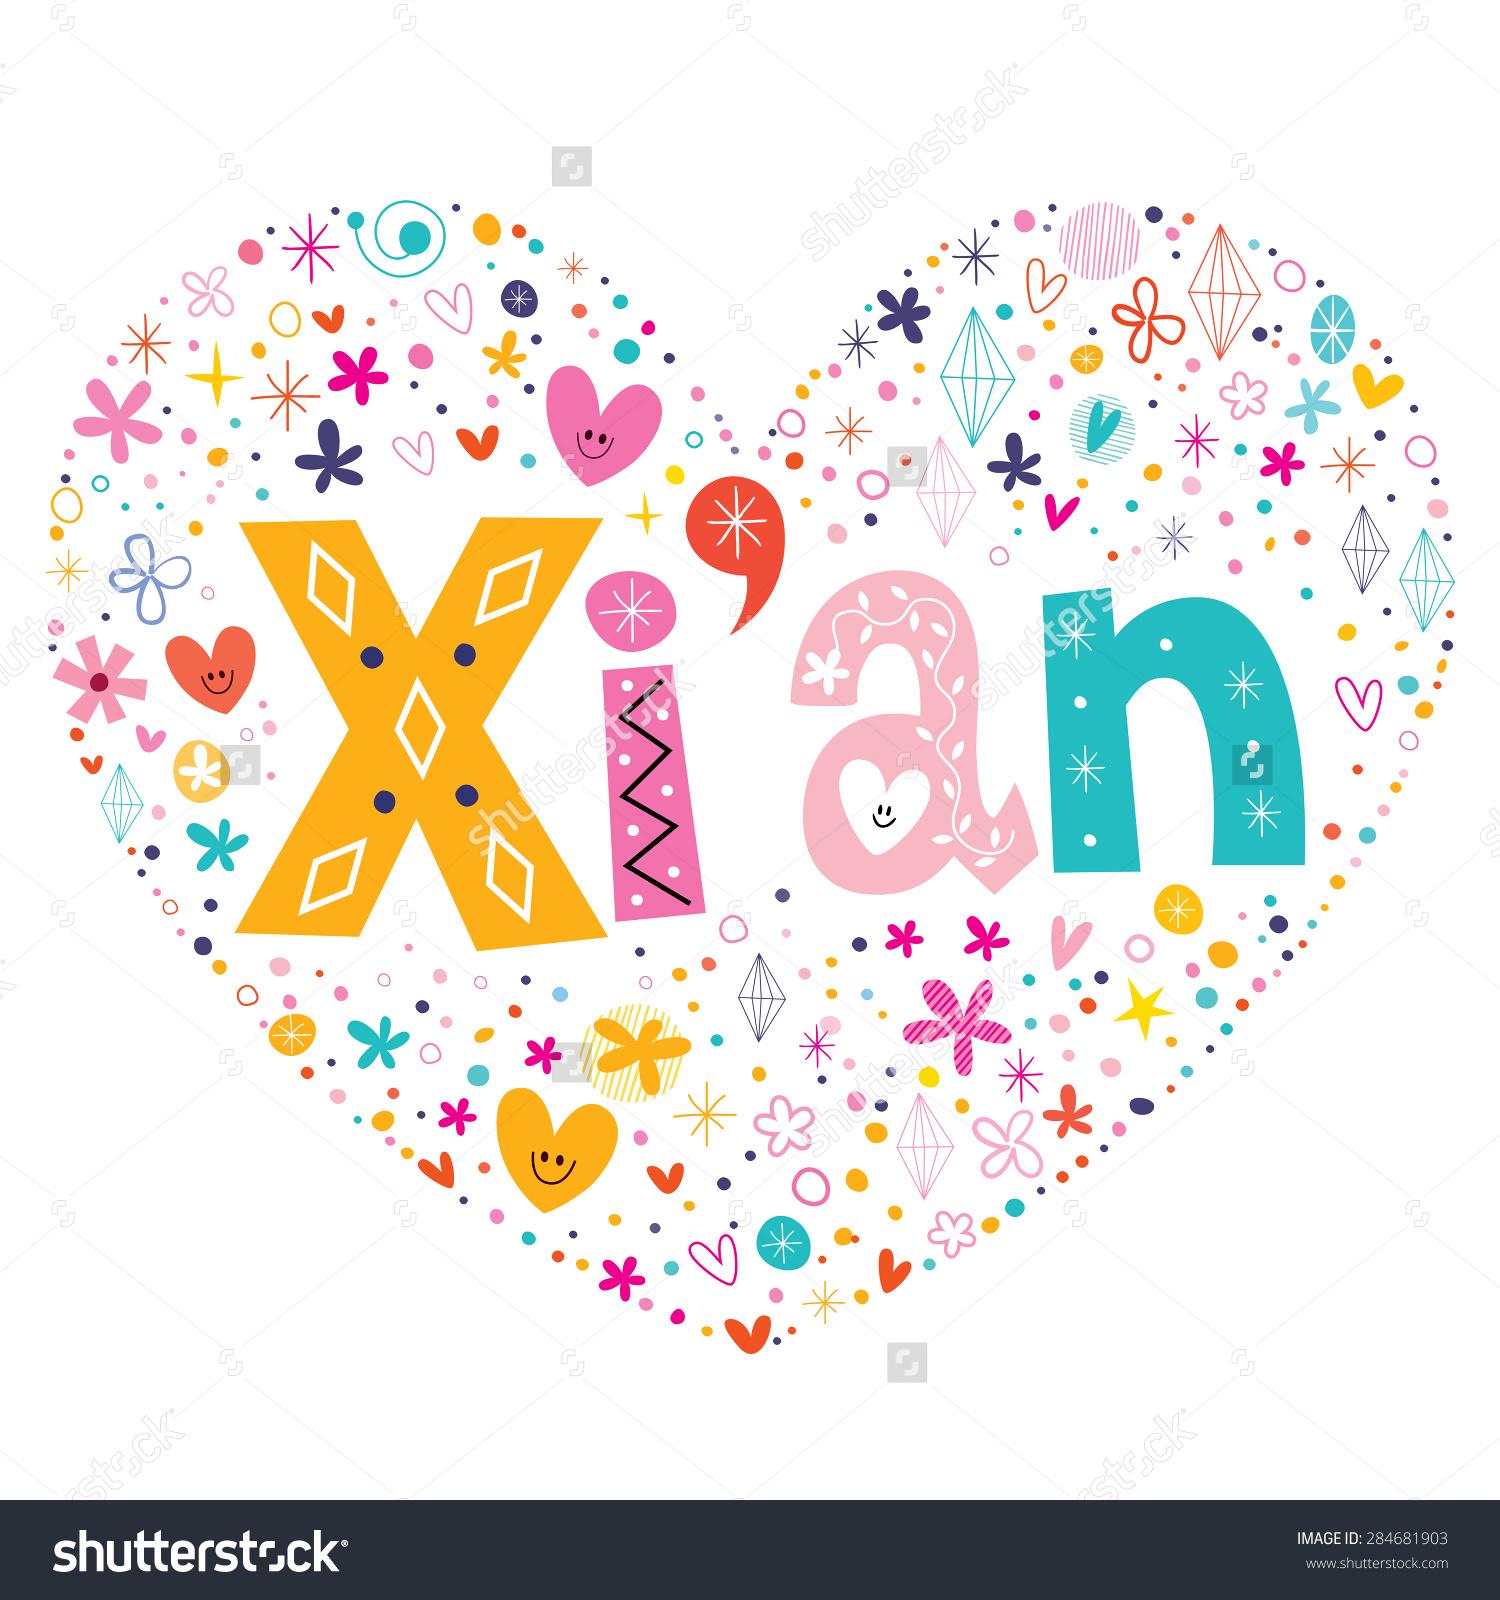 Xian Heart Shaped Type Lettering Vector Stock Vector 284681903.